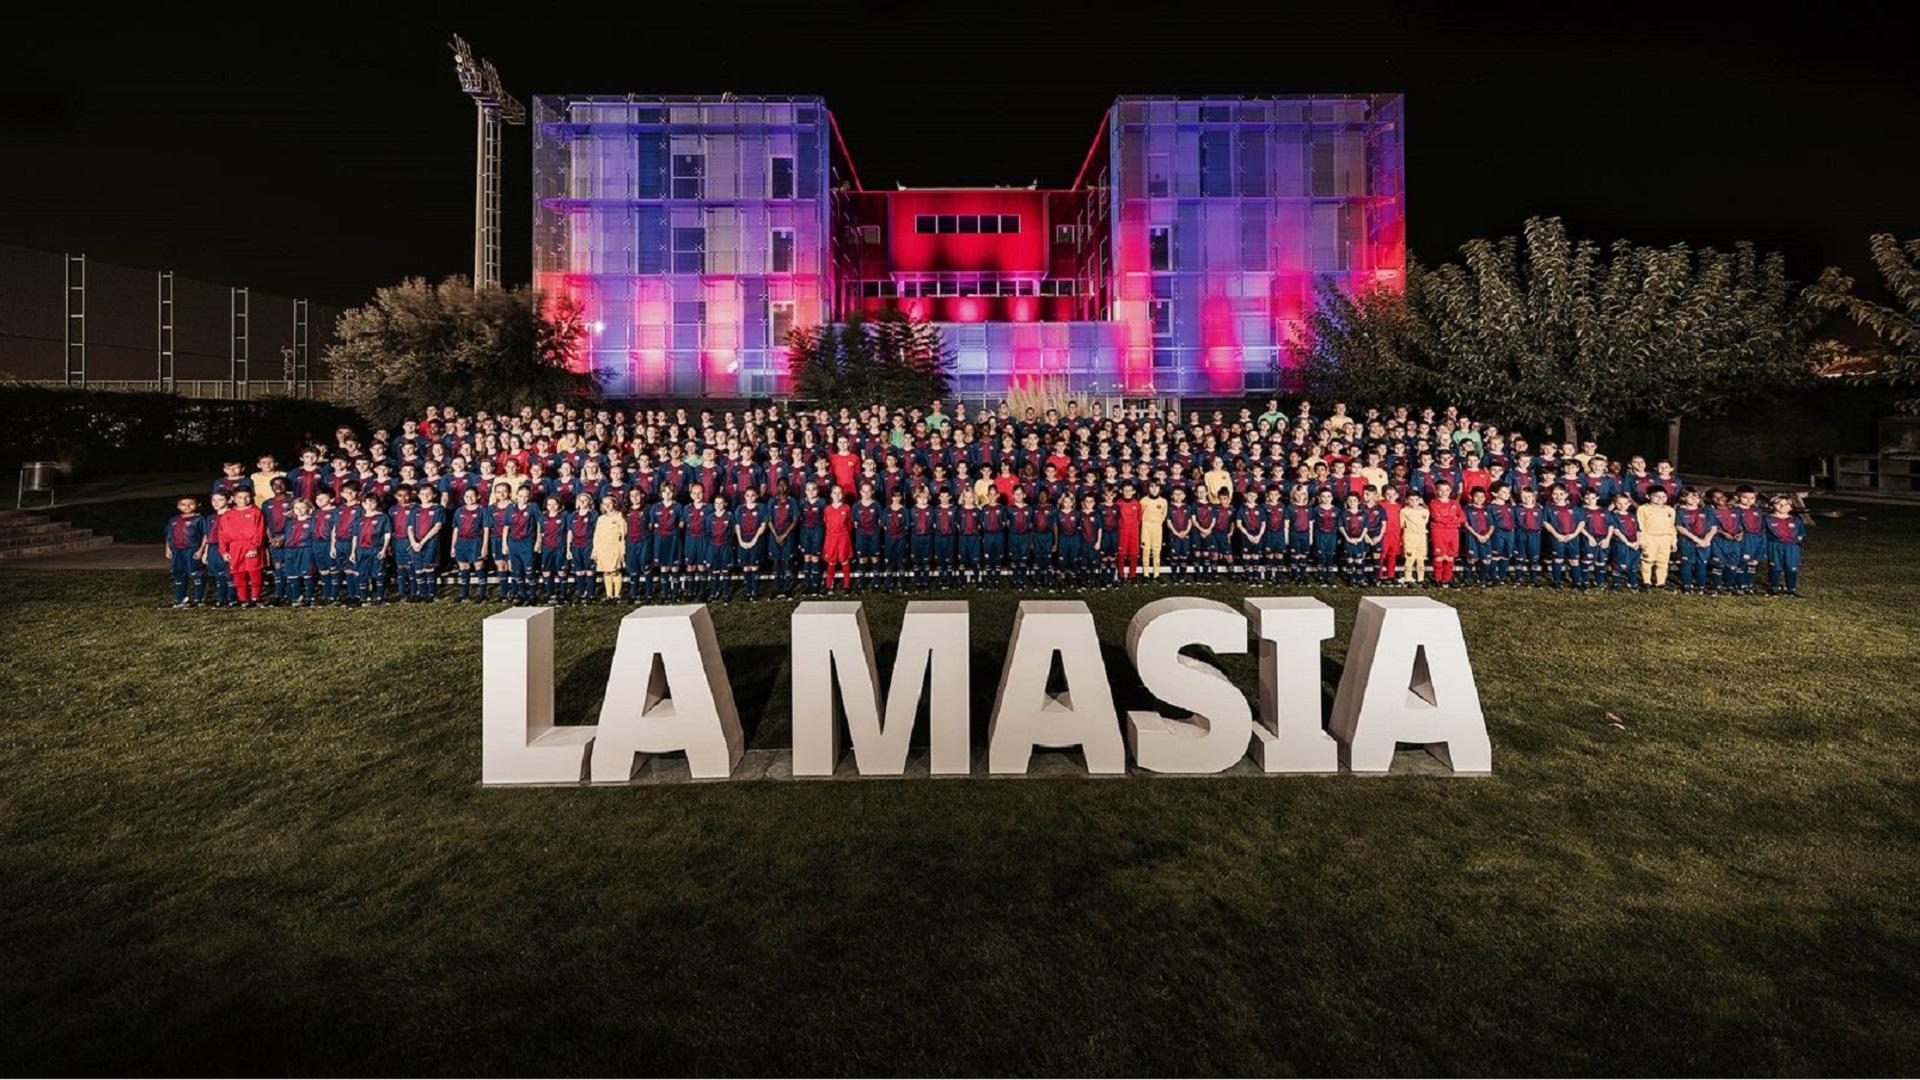 Presentation of the 2017/18 La Masia teams